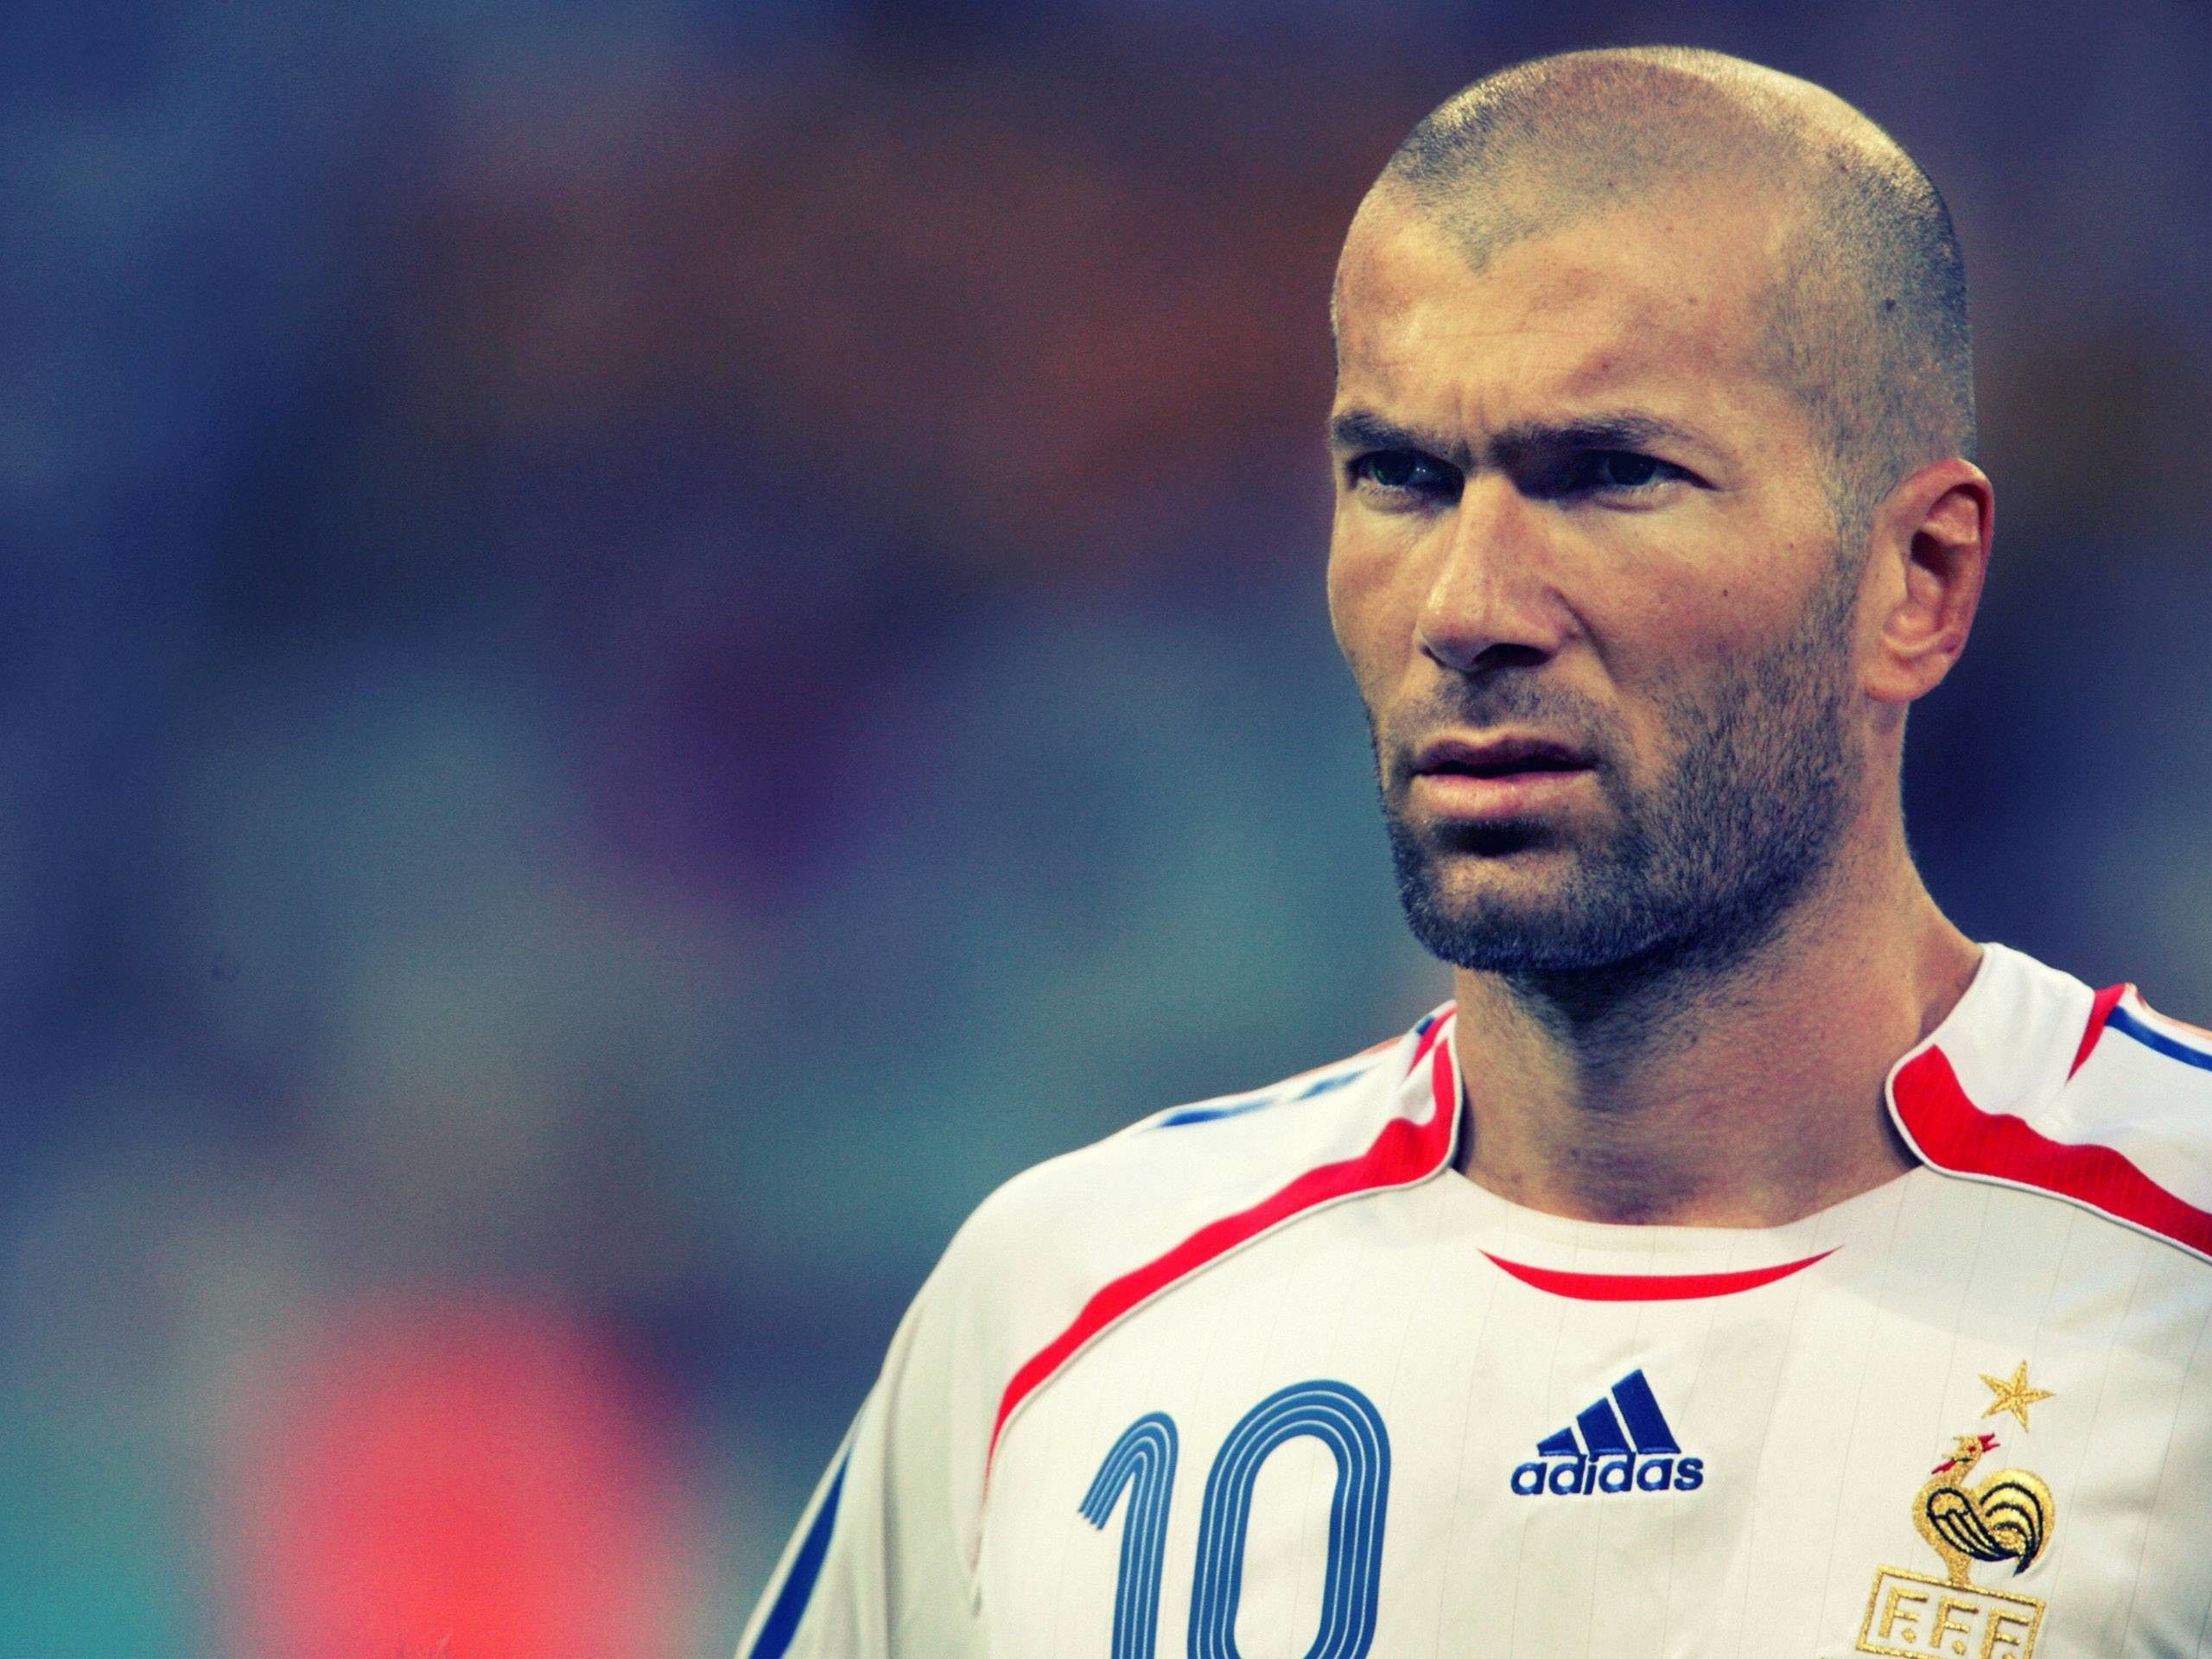 78 Zinedine Zidane Wallpapers on WallpaperPlay i 2020